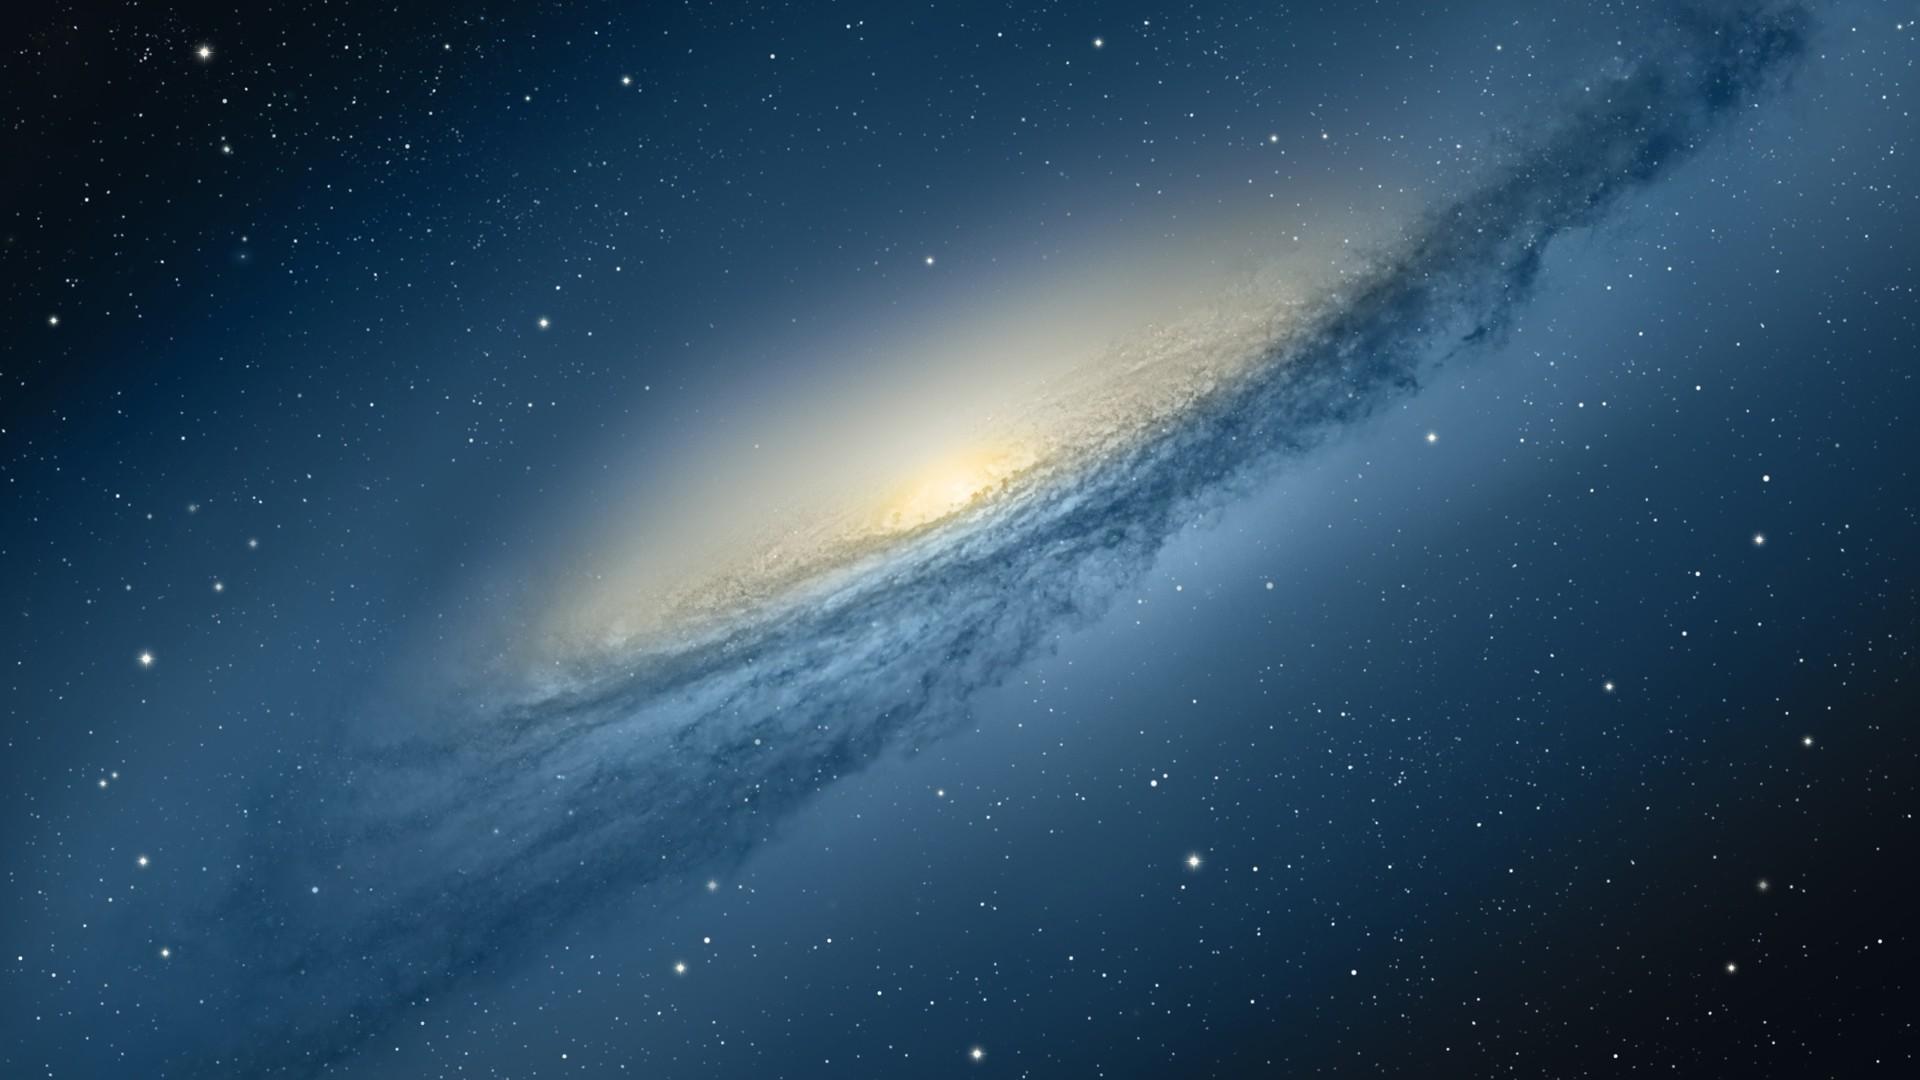 Galaxy Nebula desktop wallpaper